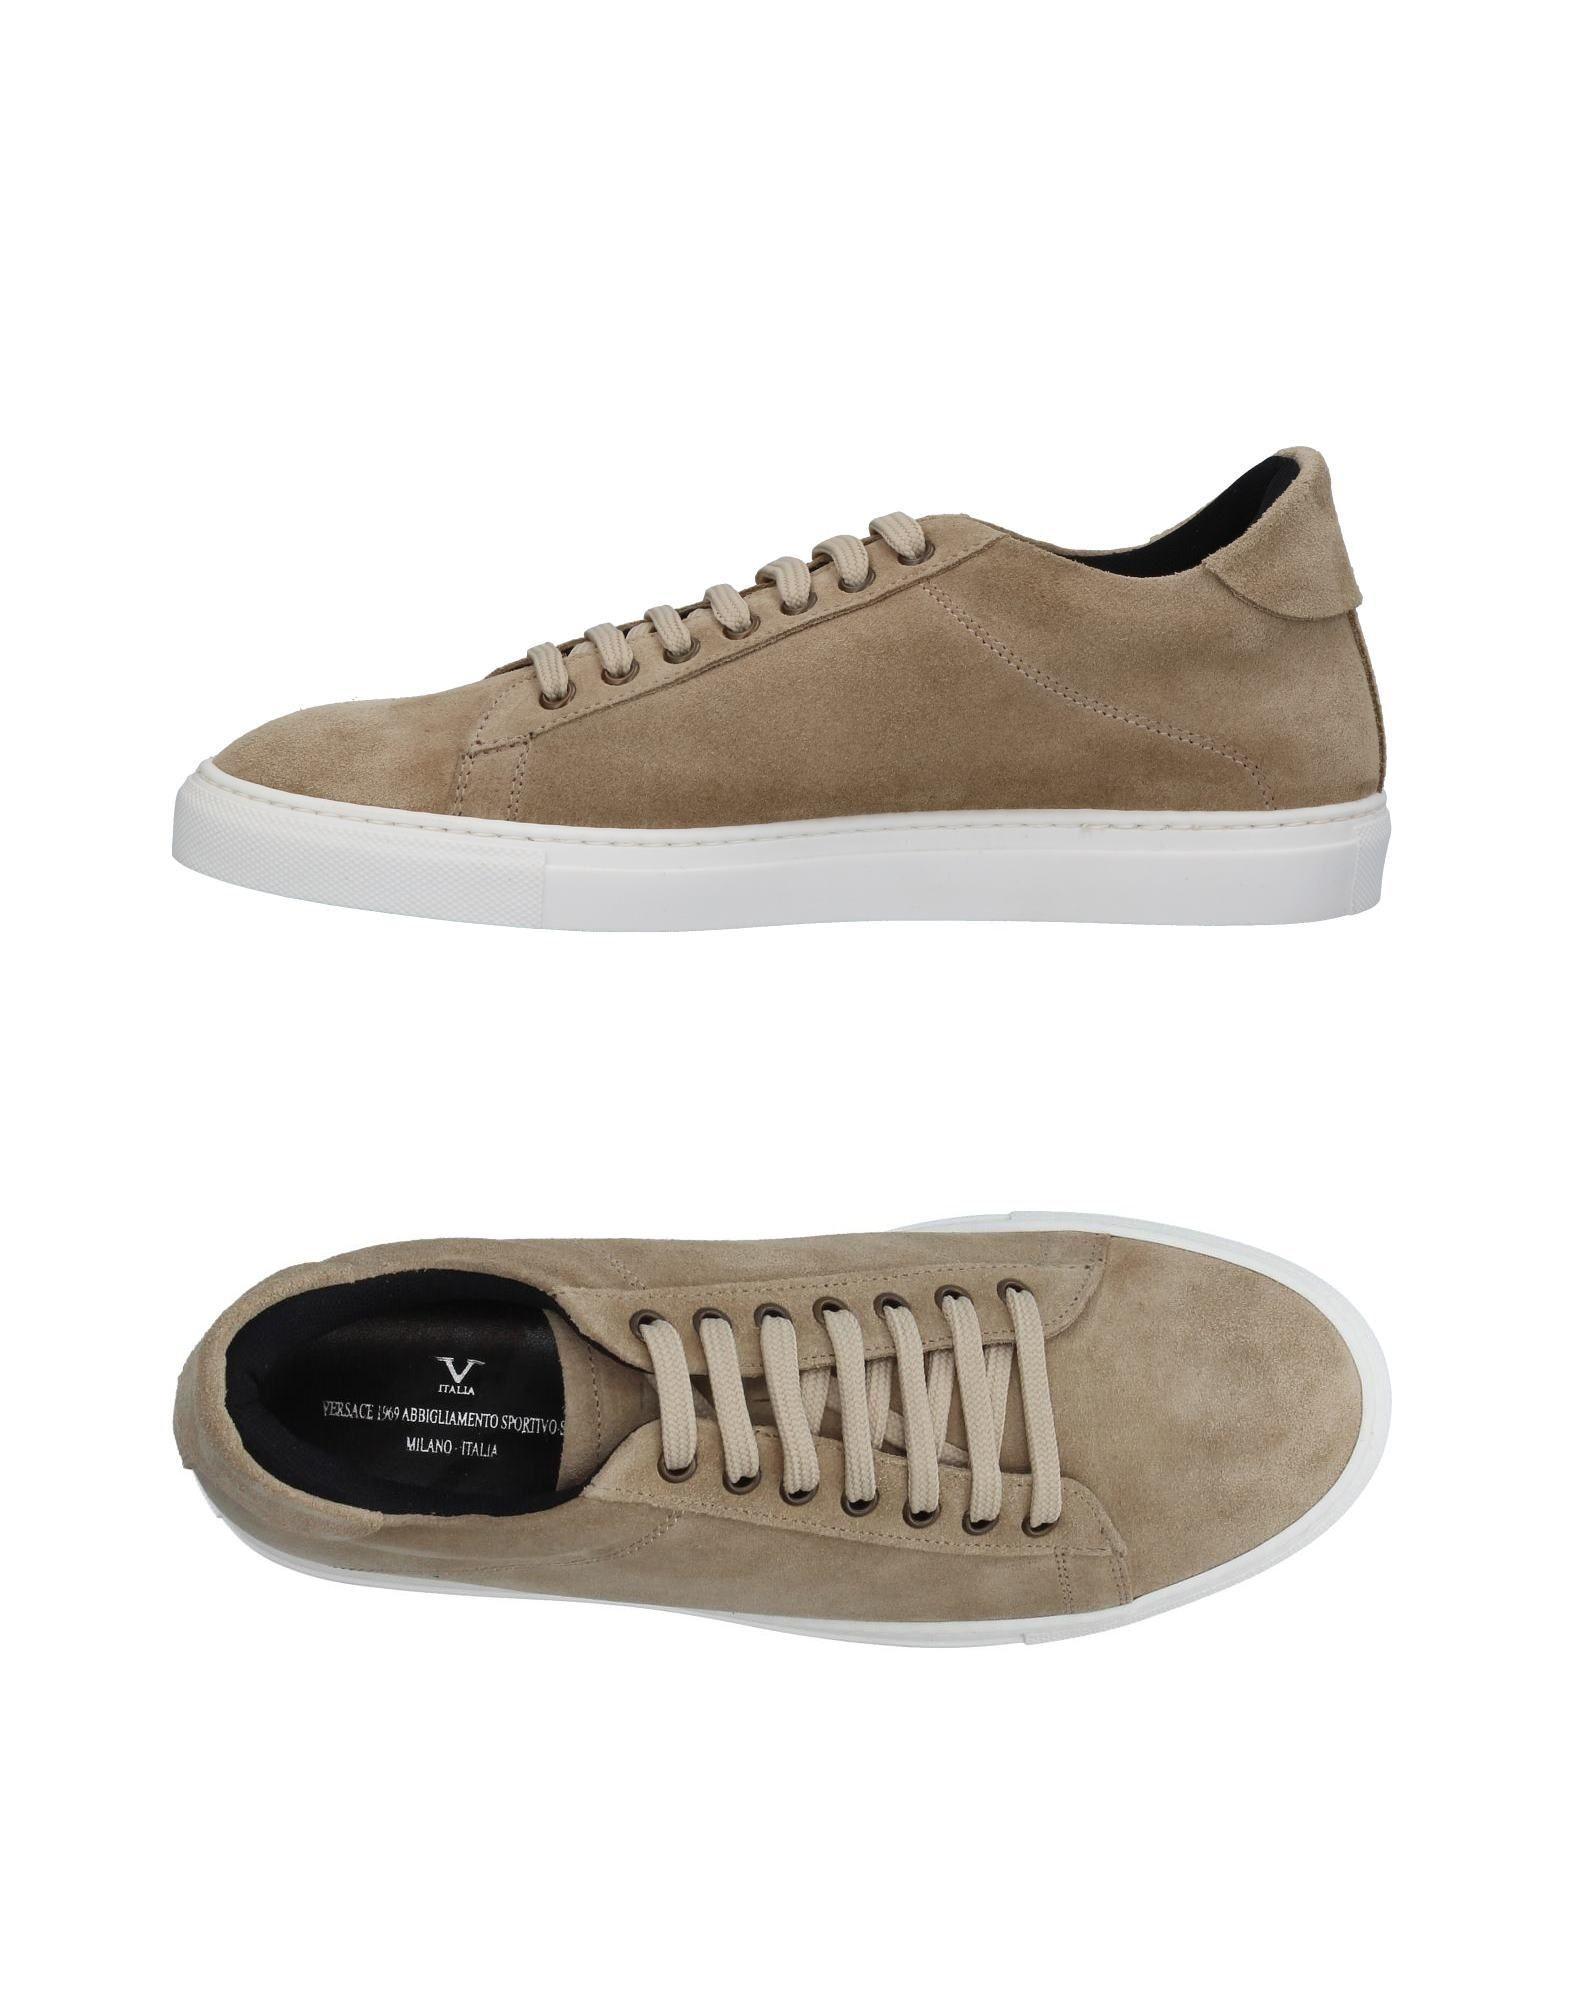 V Herren Italia Sneakers Herren V Gutes Preis-Leistungs-Verhältnis, es lohnt sich b76708